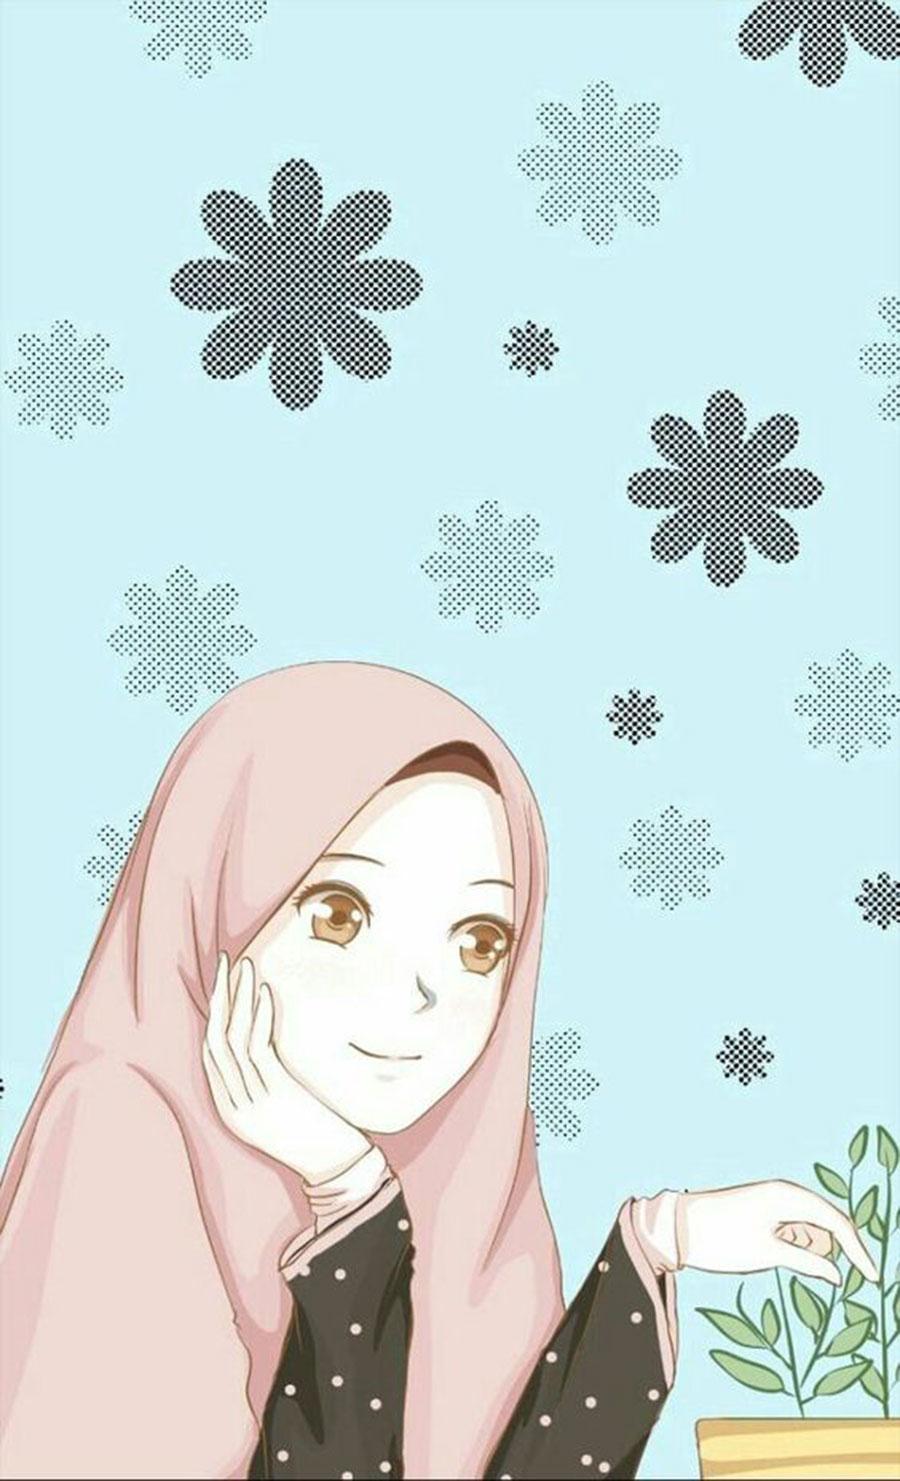 24 244094 1000 gambar kartun wanita muslimah cantik dan lucu